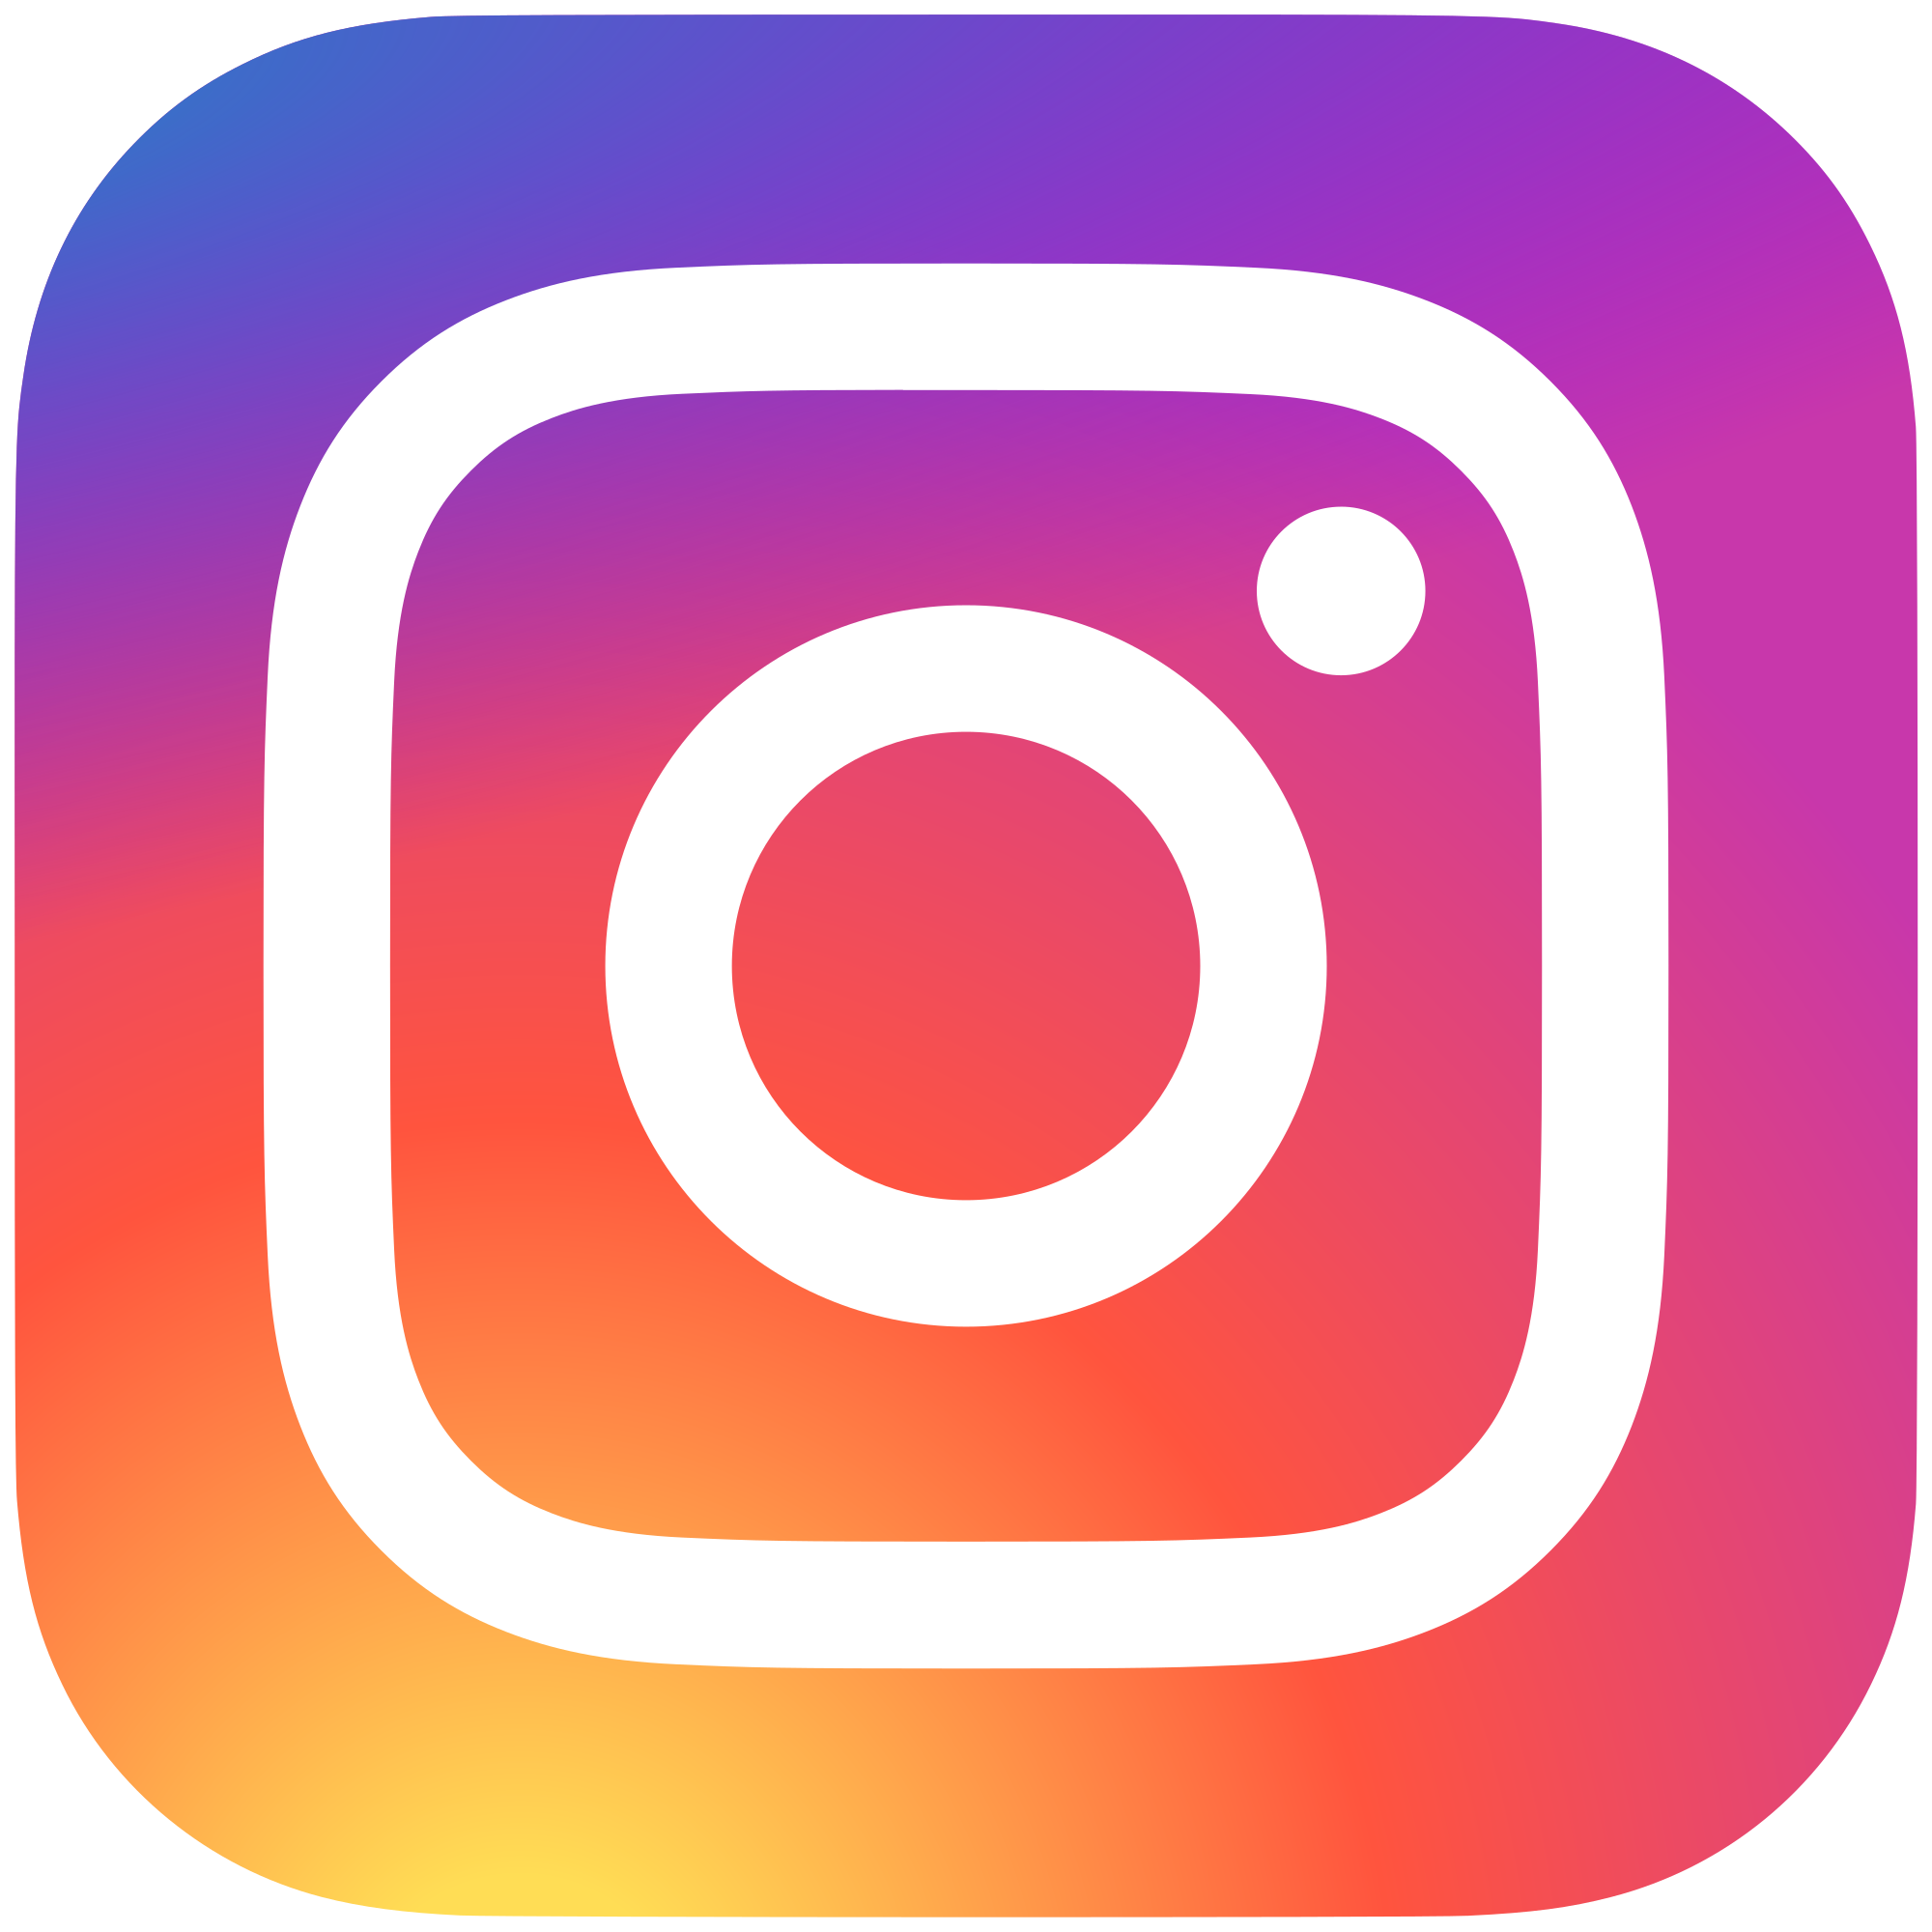 Instagram helps you focus your images Instagram logo